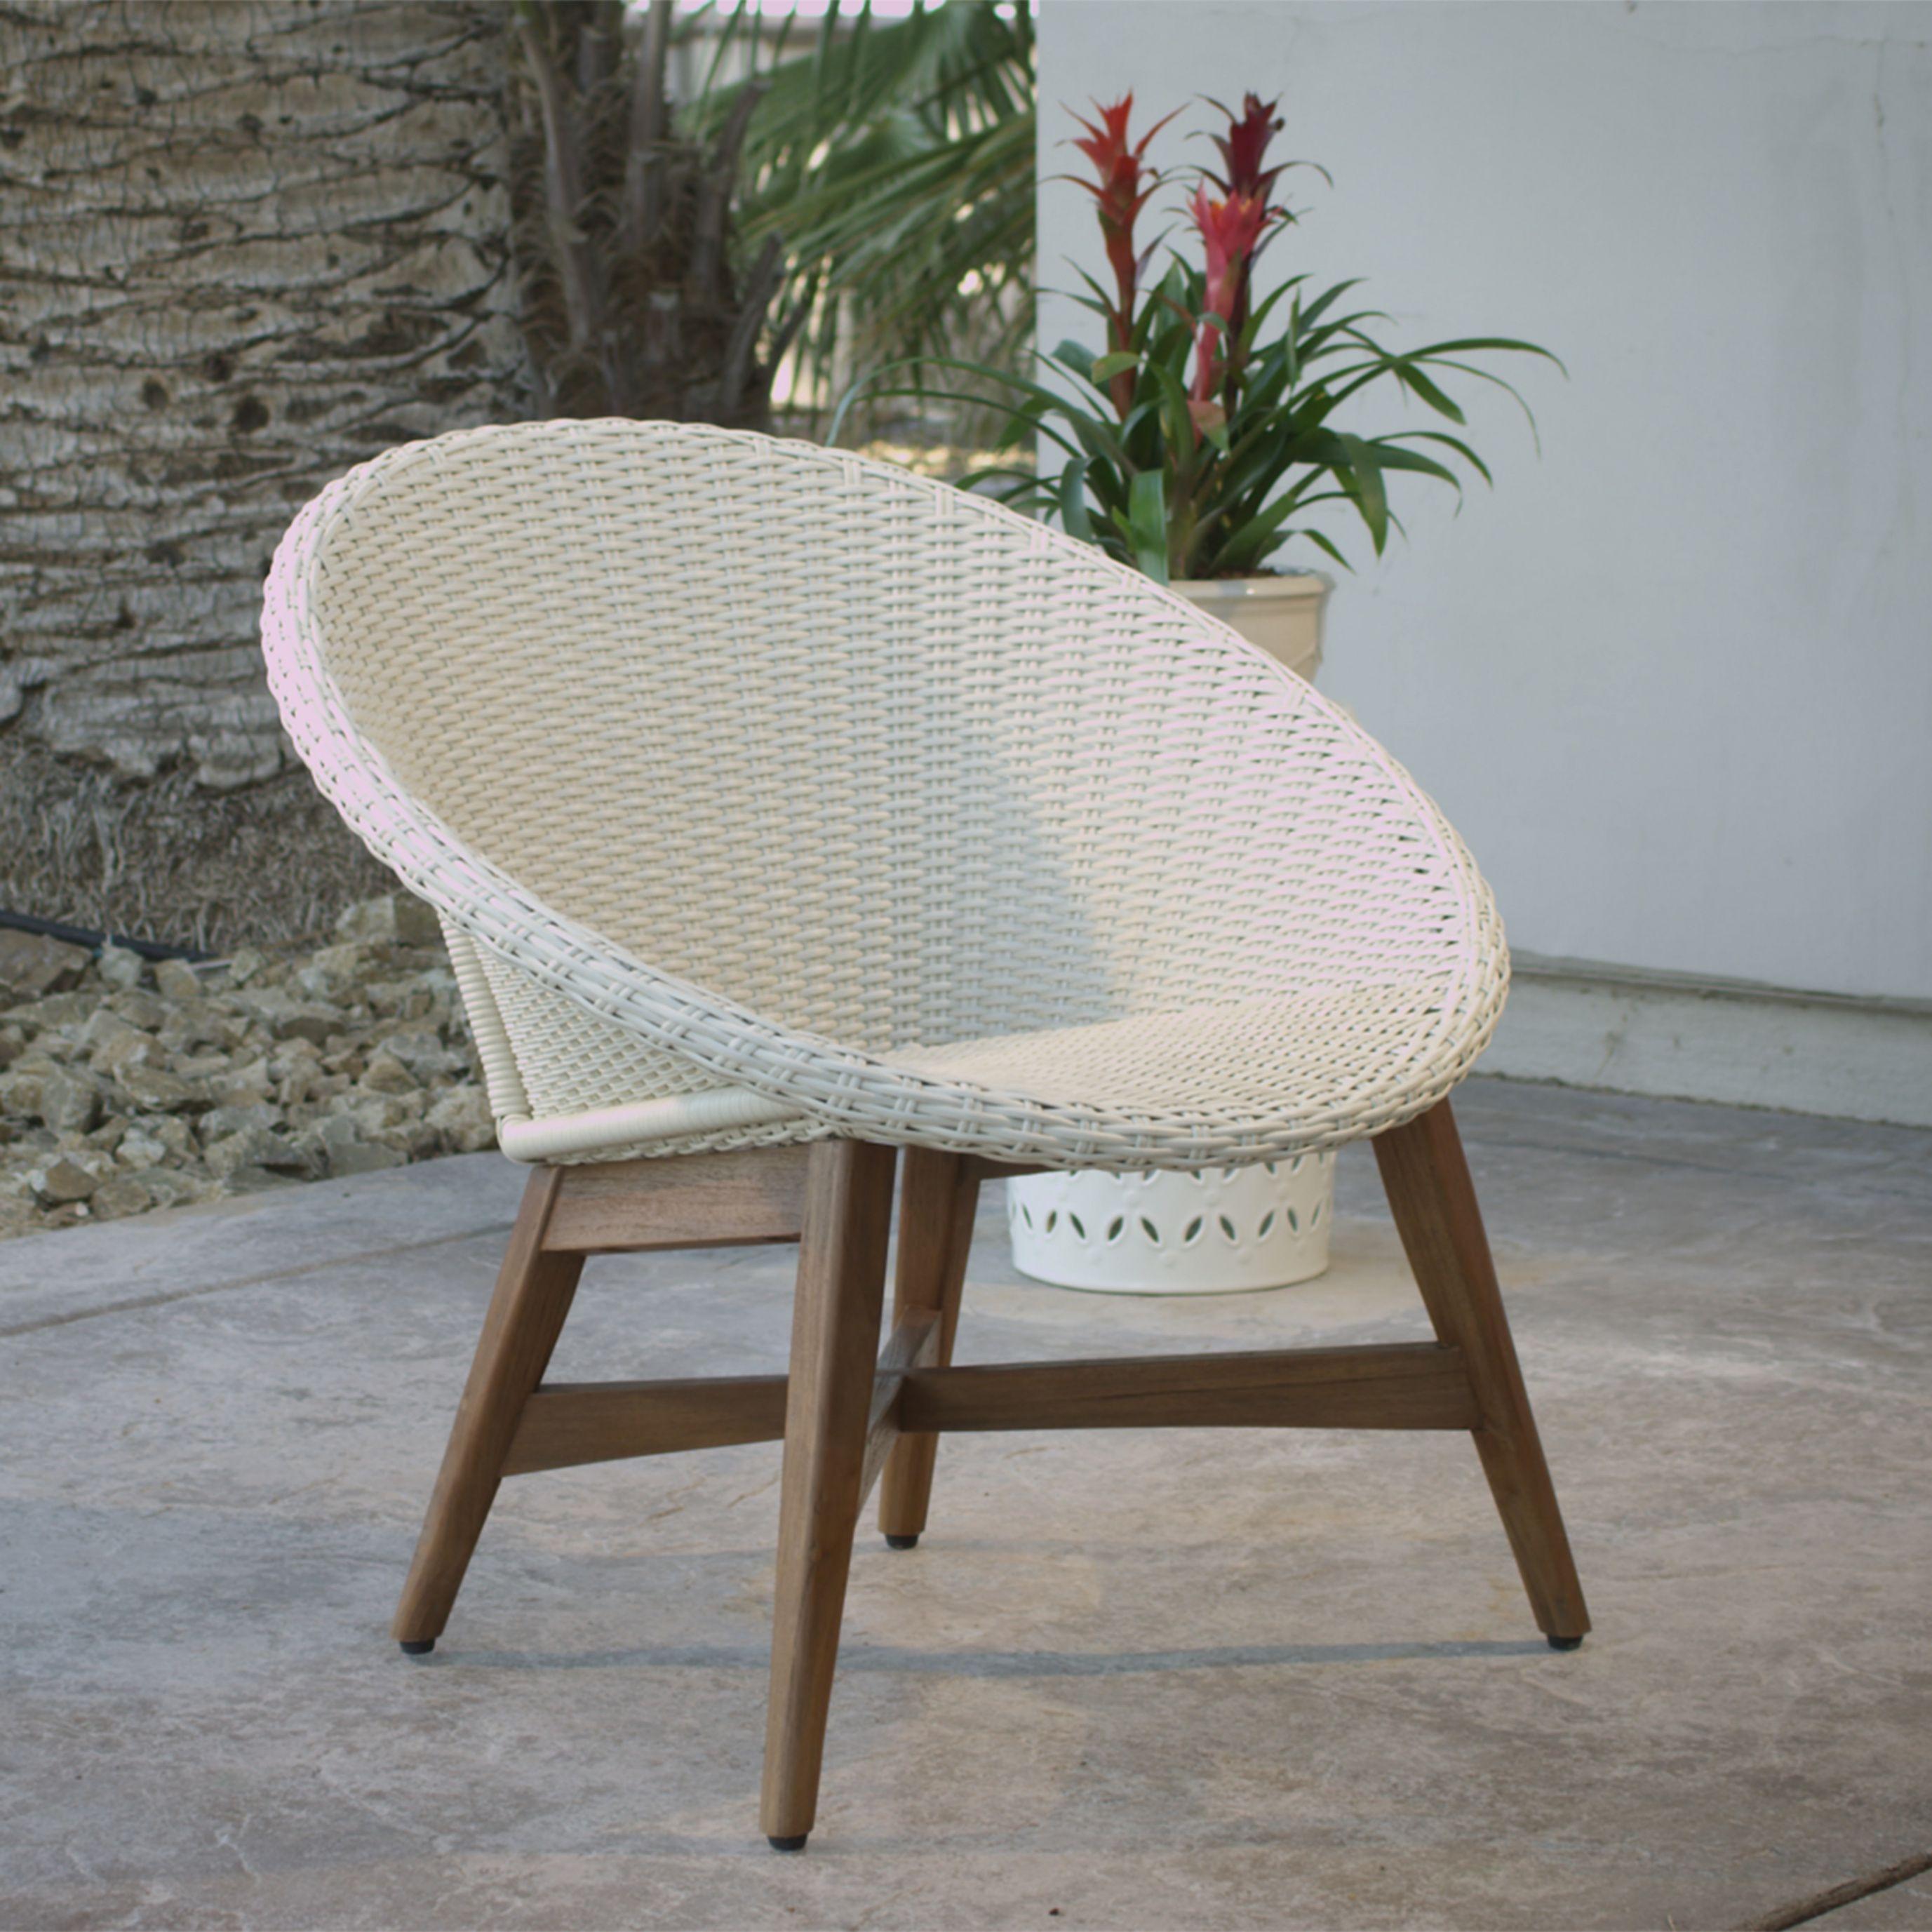 World Market Wicker Patio Furniture